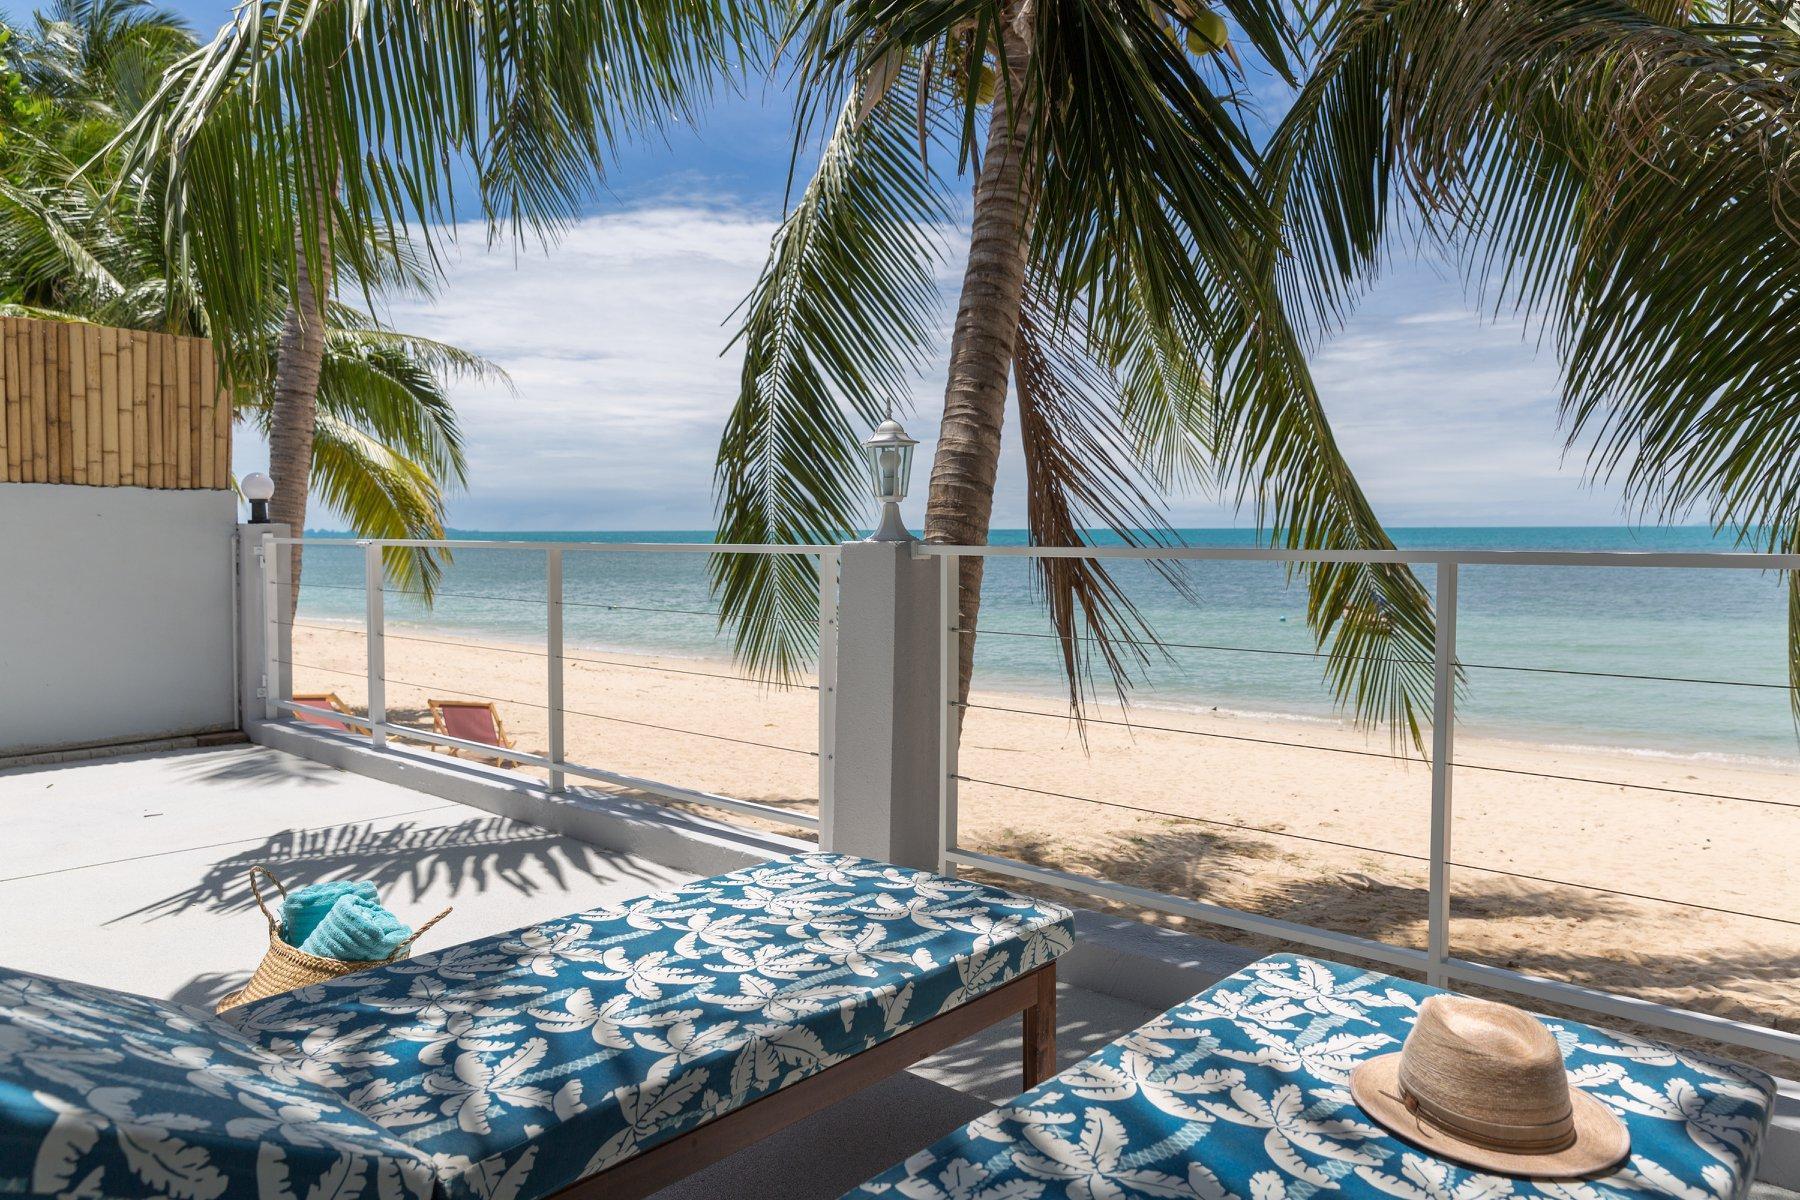 Sam-Kah Karibu Beach House บ้านเดี่ยว 3 ห้องนอน 2 ห้องน้ำส่วนตัว ขนาด 200 ตร.ม. – บางปอ